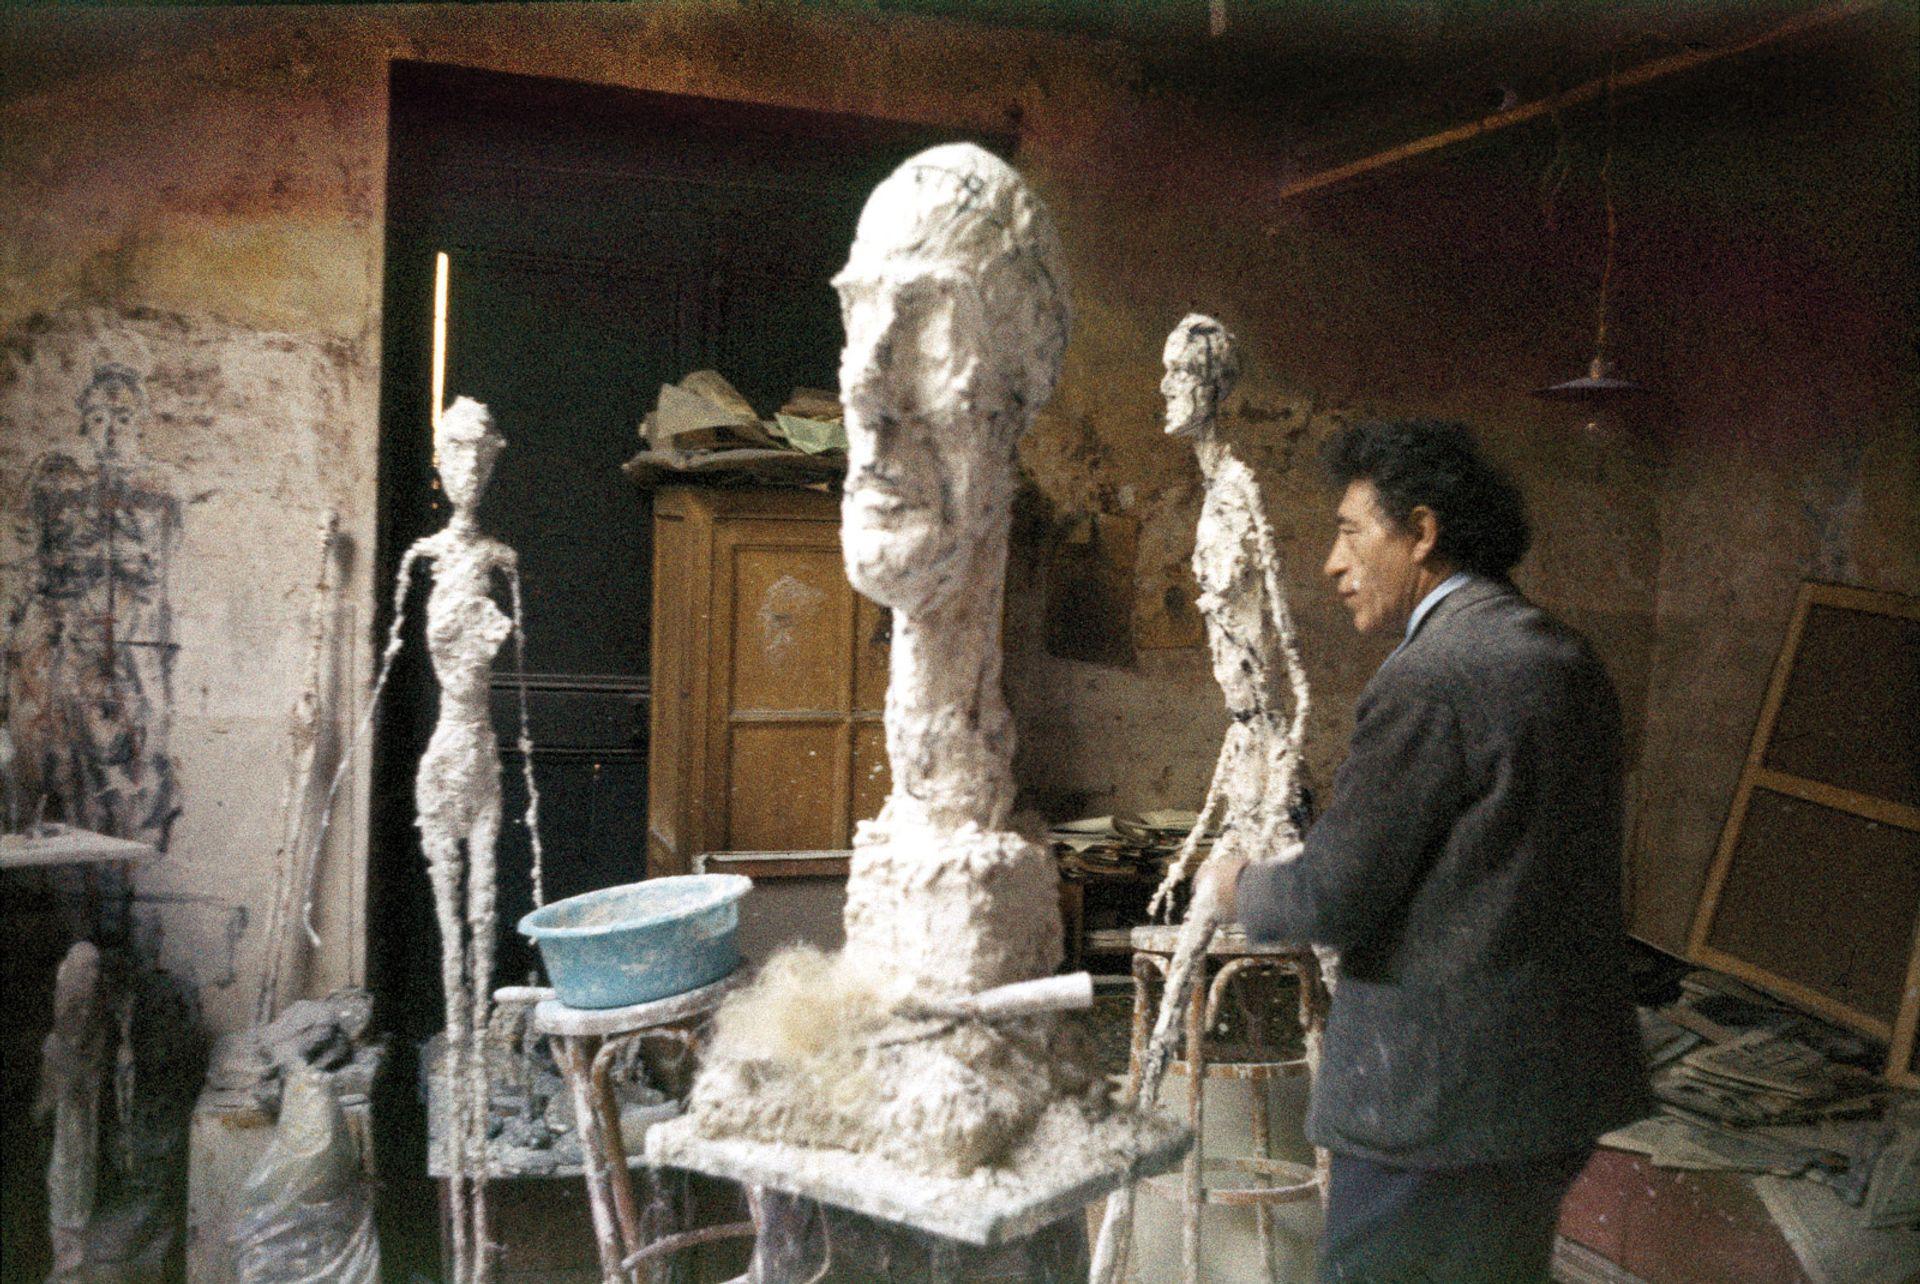 The artist in his studio on Rue Hippolyte-Maindron  around 1960. Ernst Scheidegger/Giacometti Foundation Archives; © Giacometti Estate (Giacometti Foundation + ADAGP)